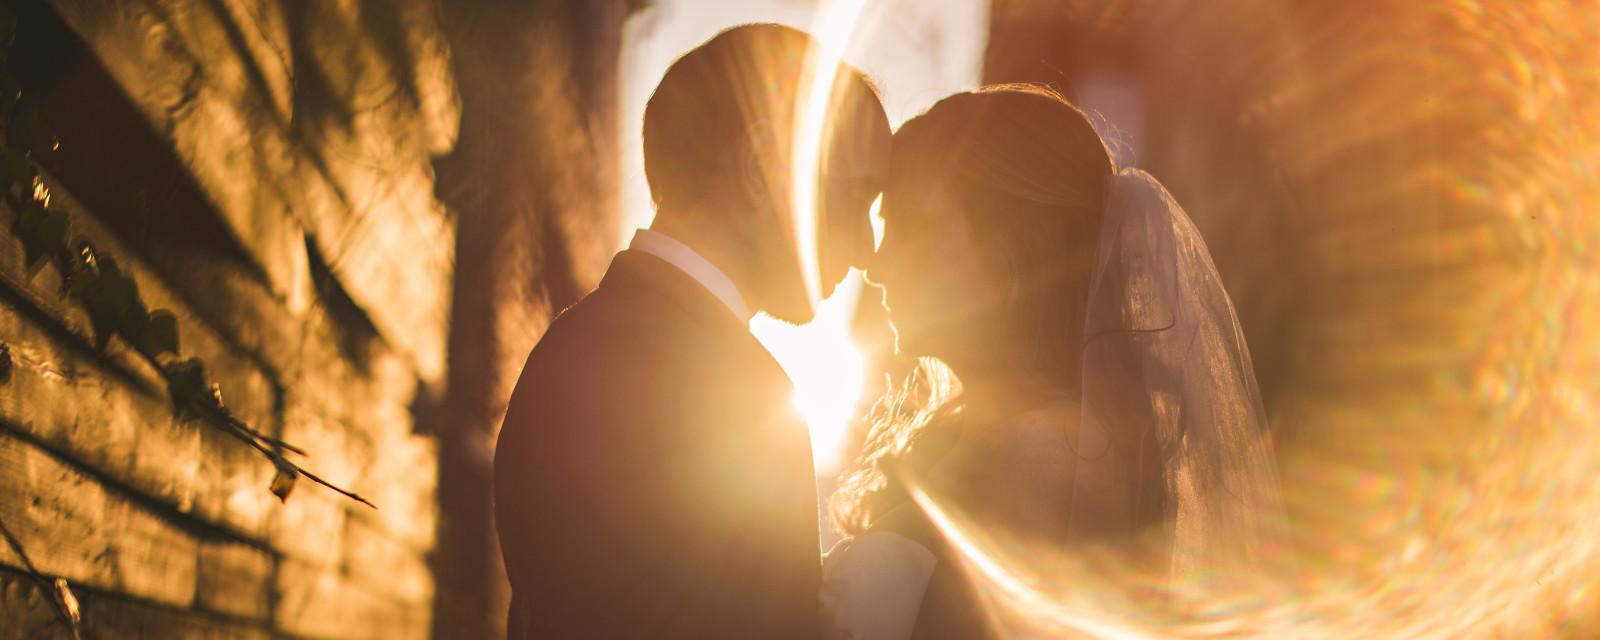 james + christine // longview gallery wedding in dc